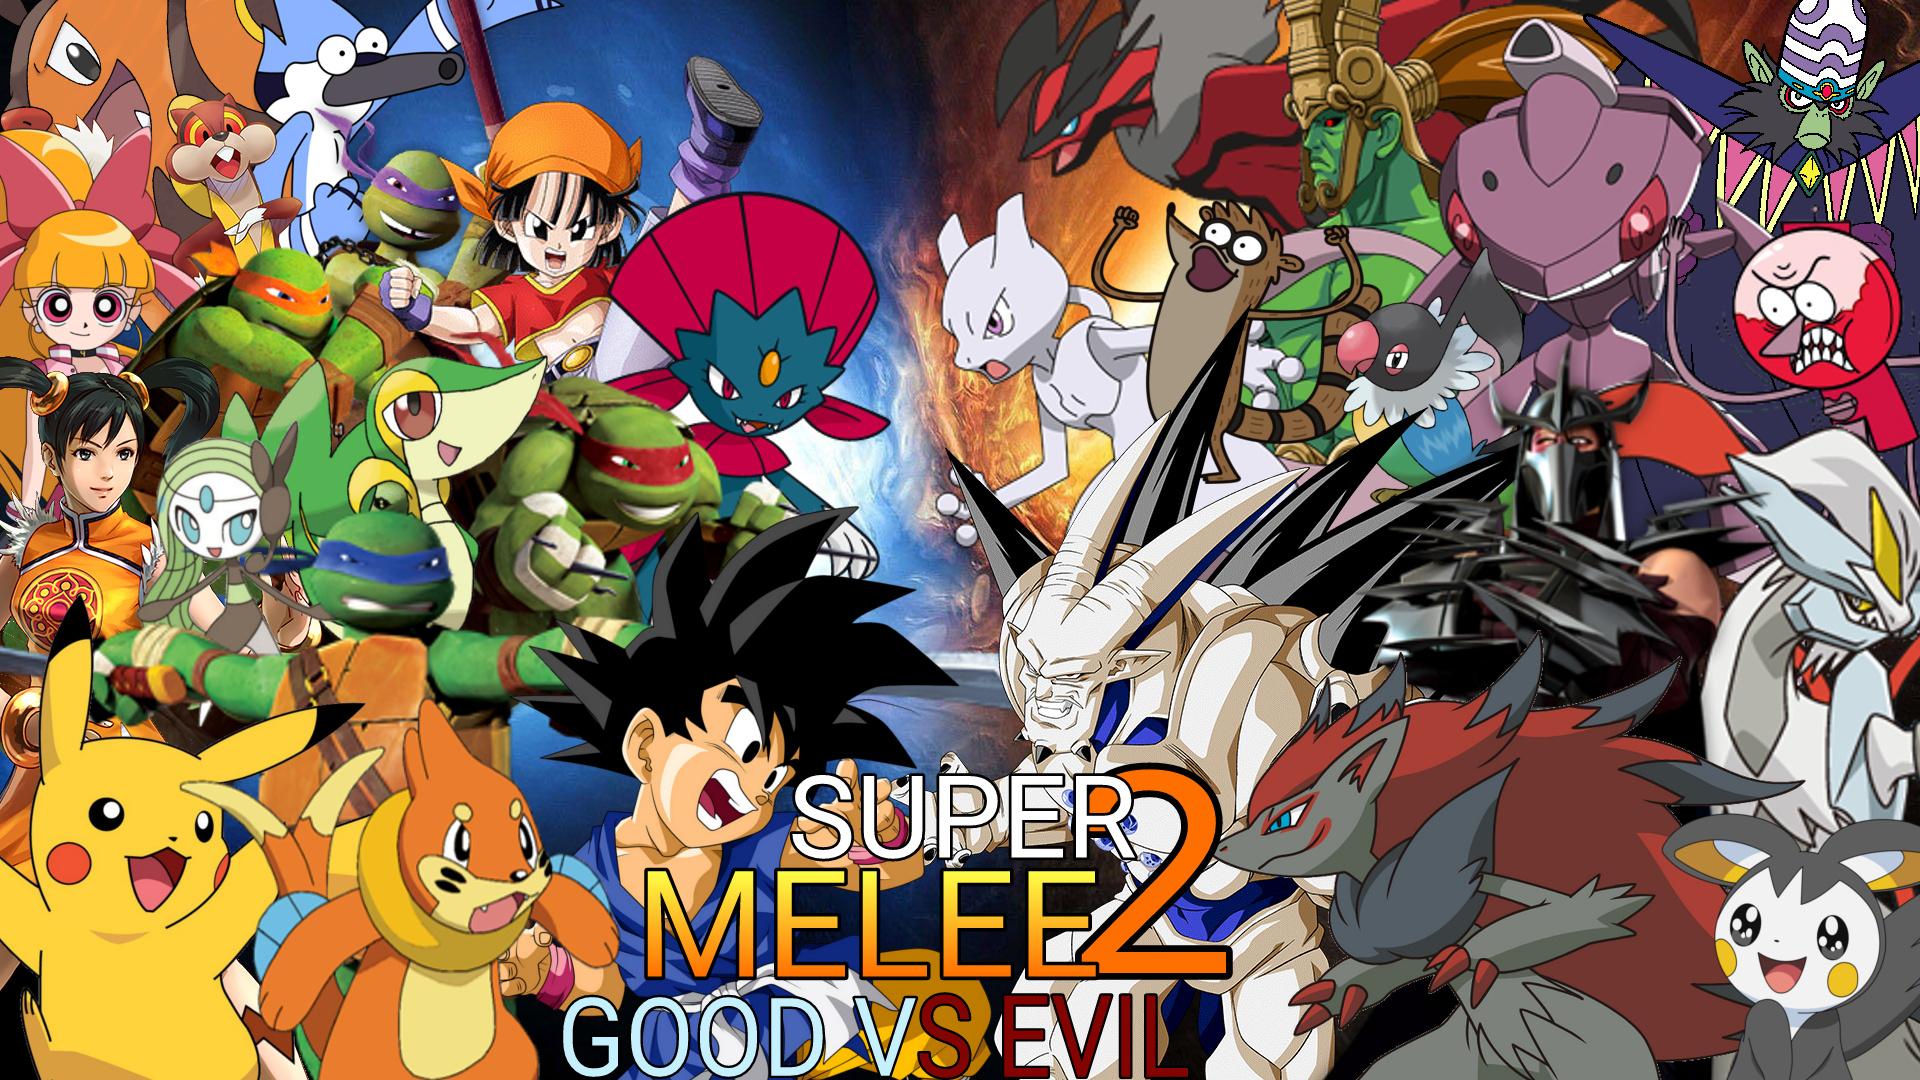 Super Melee 2: Good vs Evil